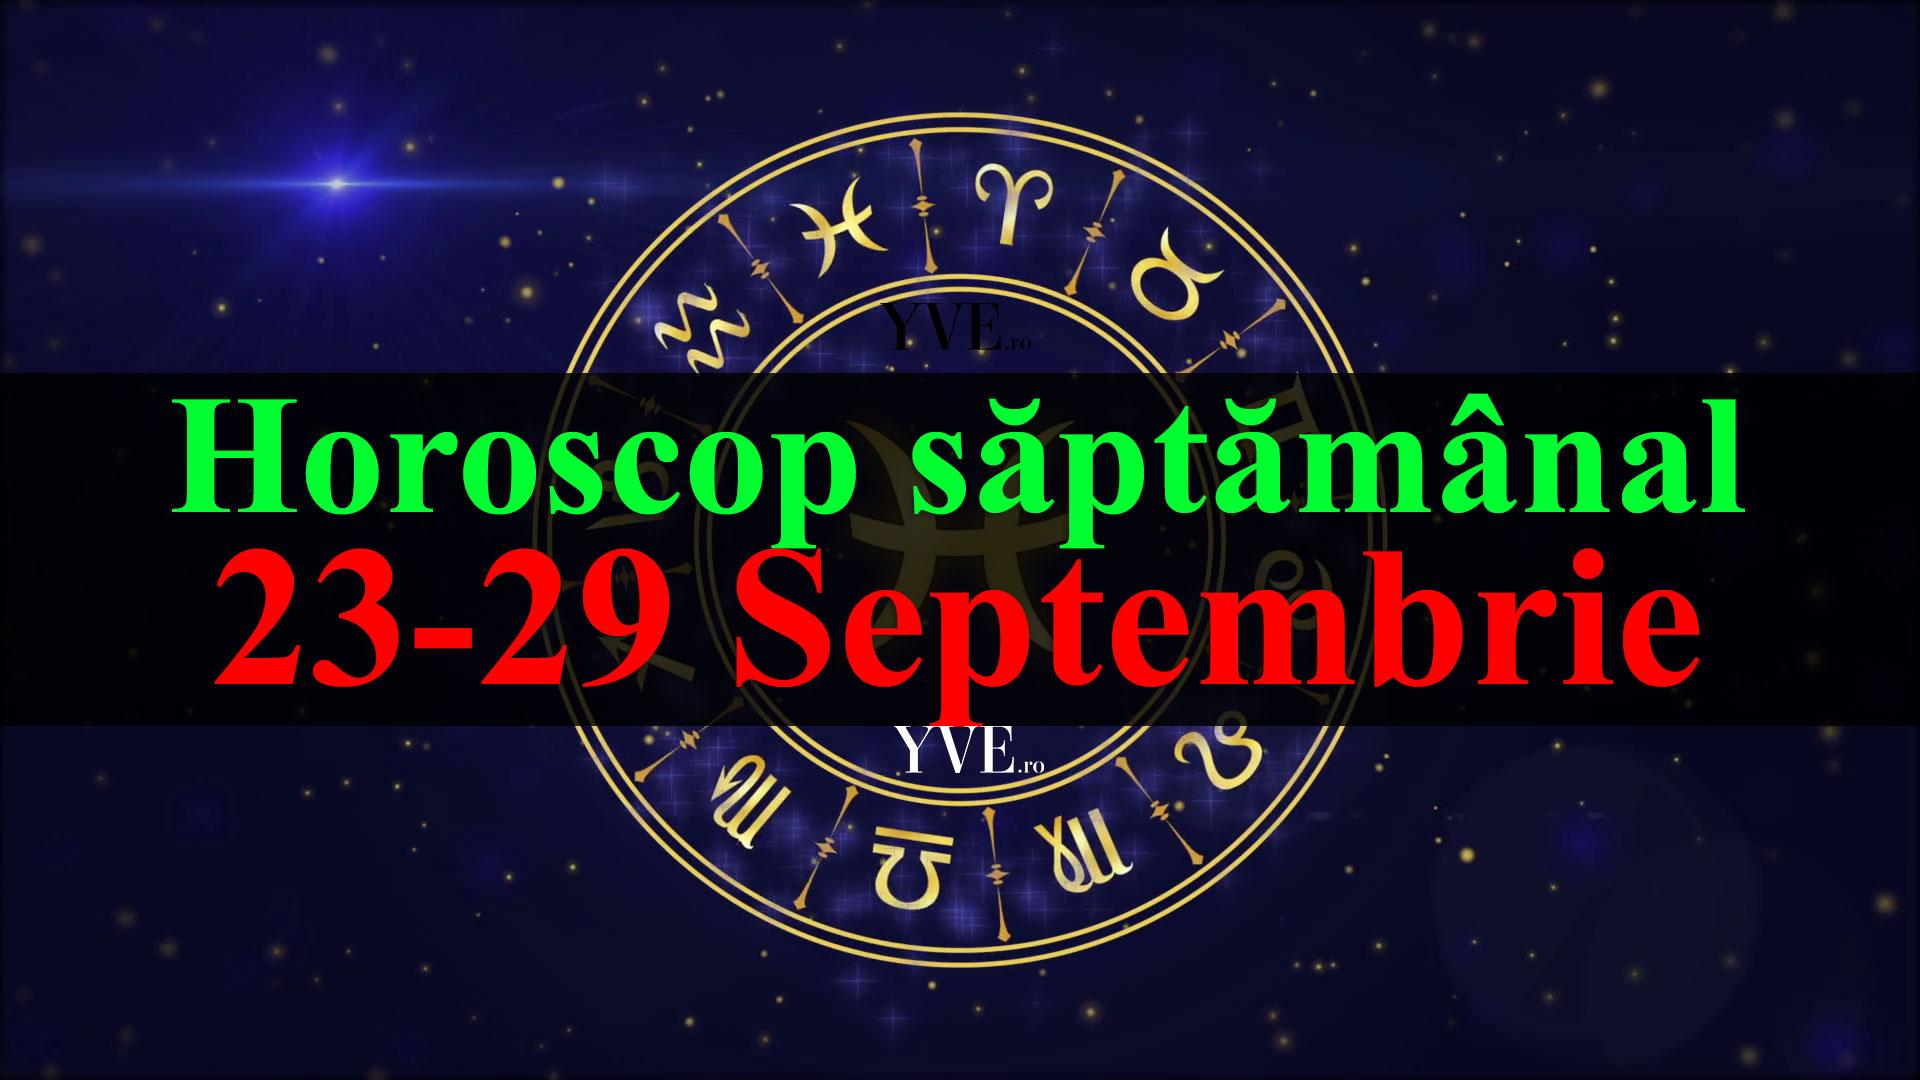 Horoscop saptamanal 23-29 Septembrie 2019